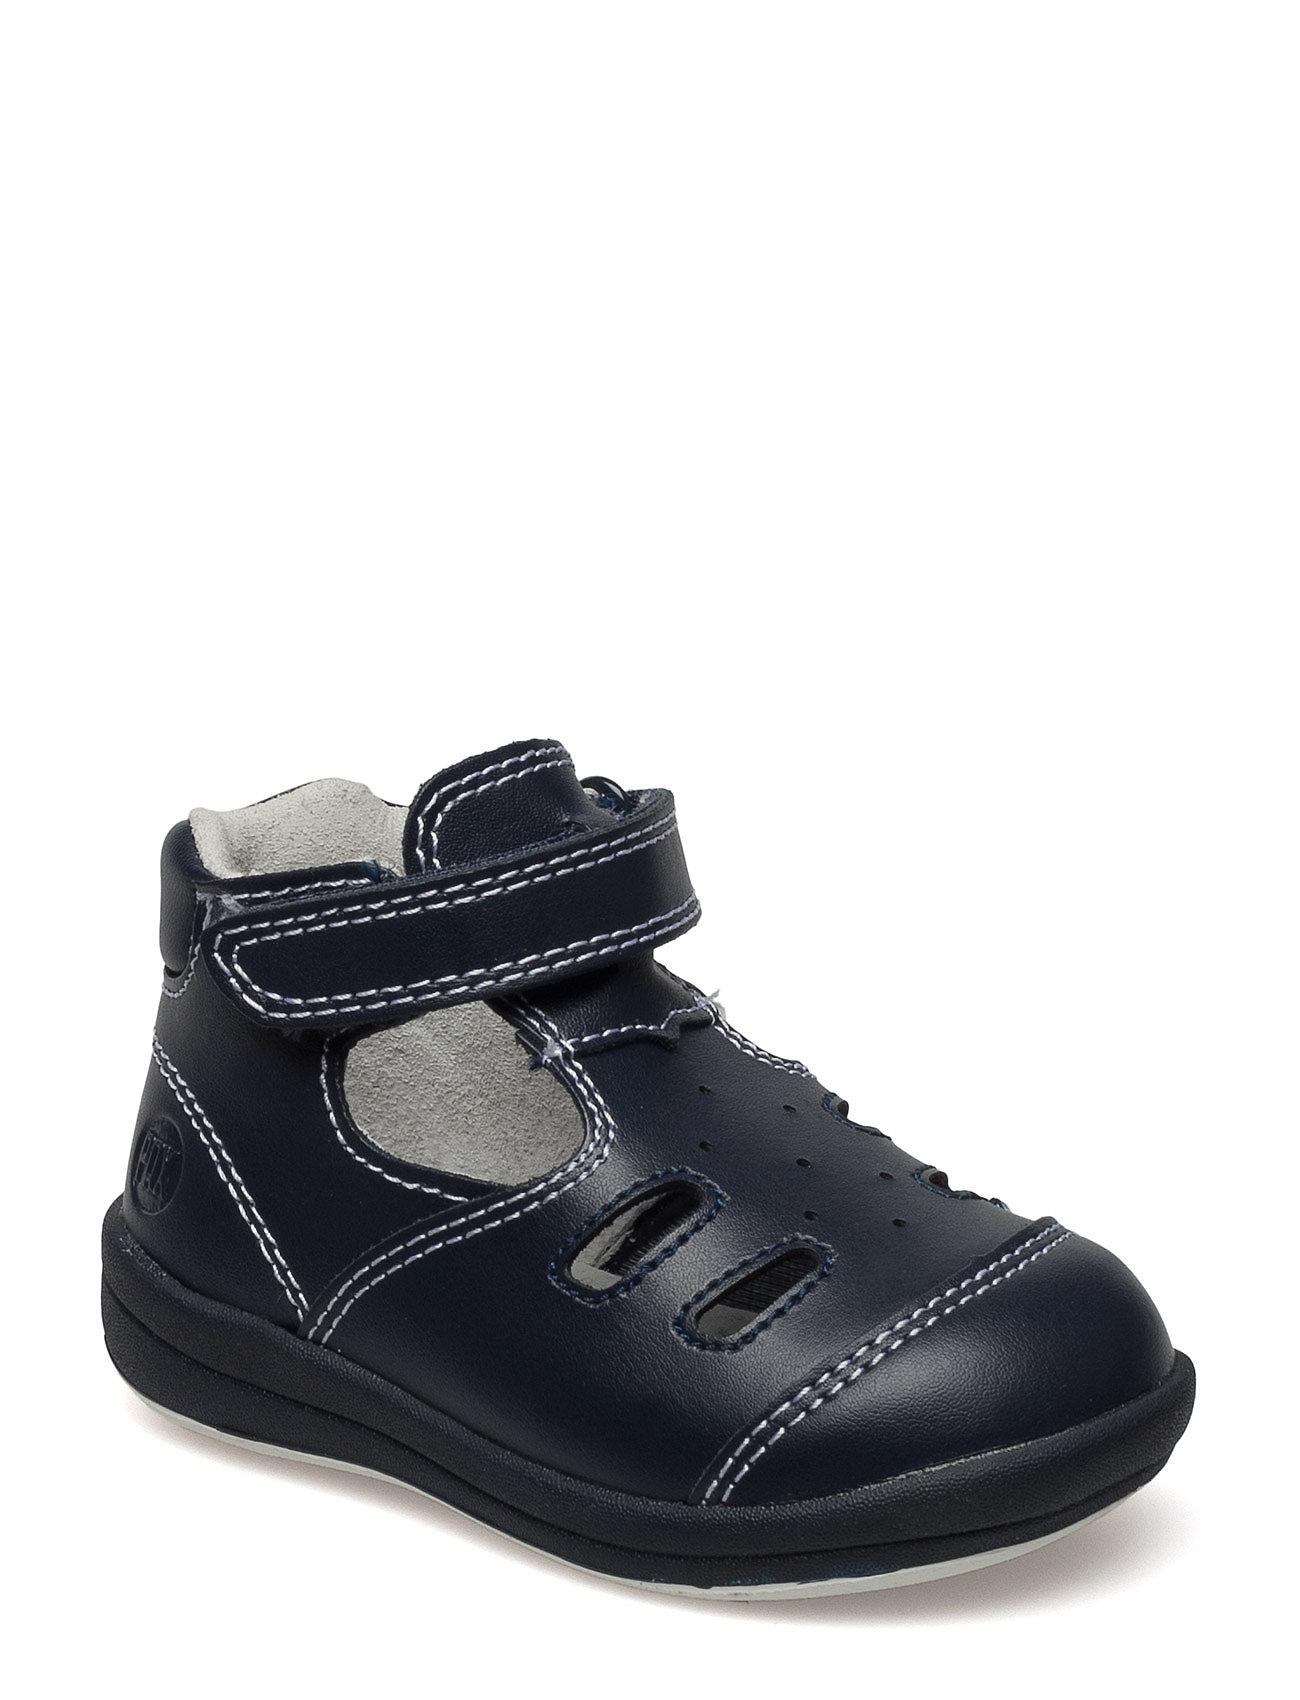 Grain PAX Sko & Sneakers til Børn i Navy blå